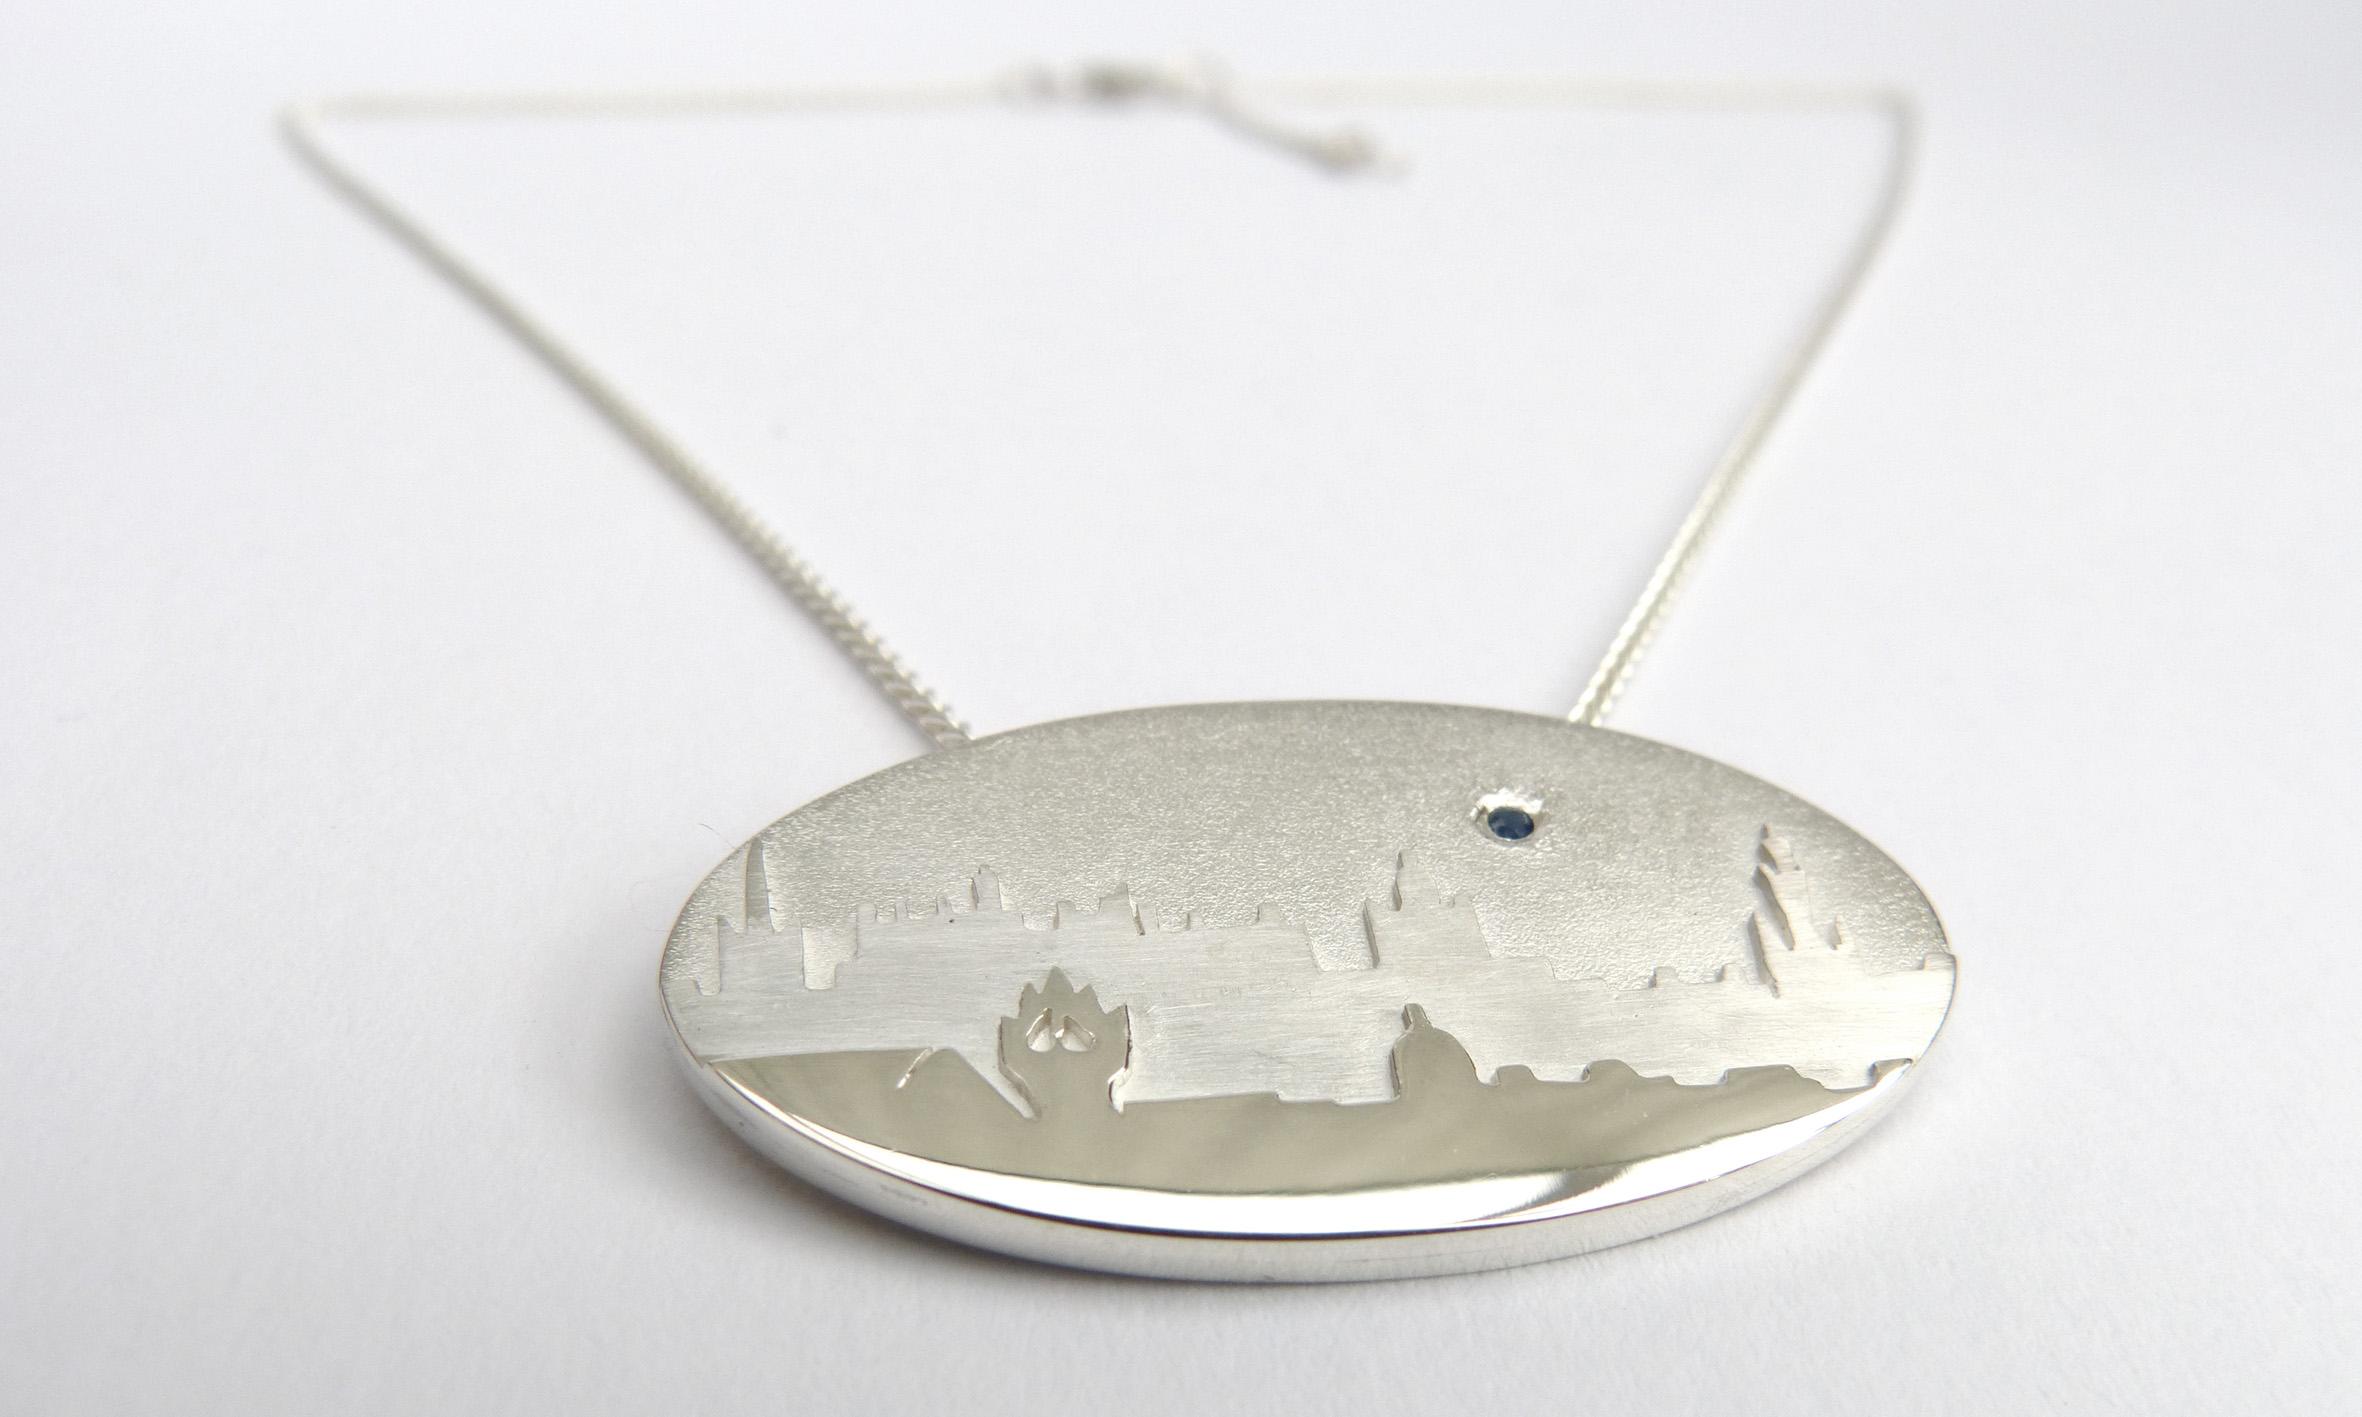 Edinburgh layered necklace